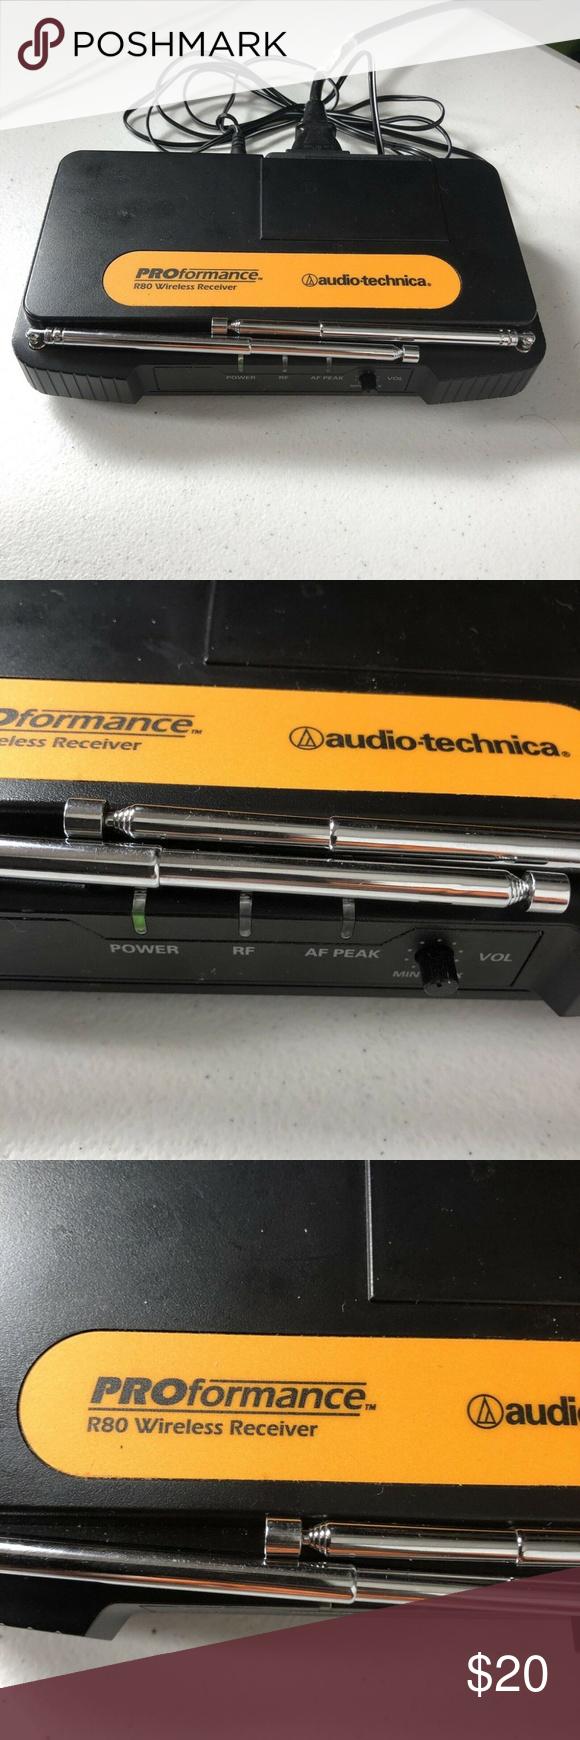 Audio Technica Proformance R80 Wireless Receiver Audio Technica Audio Receiver